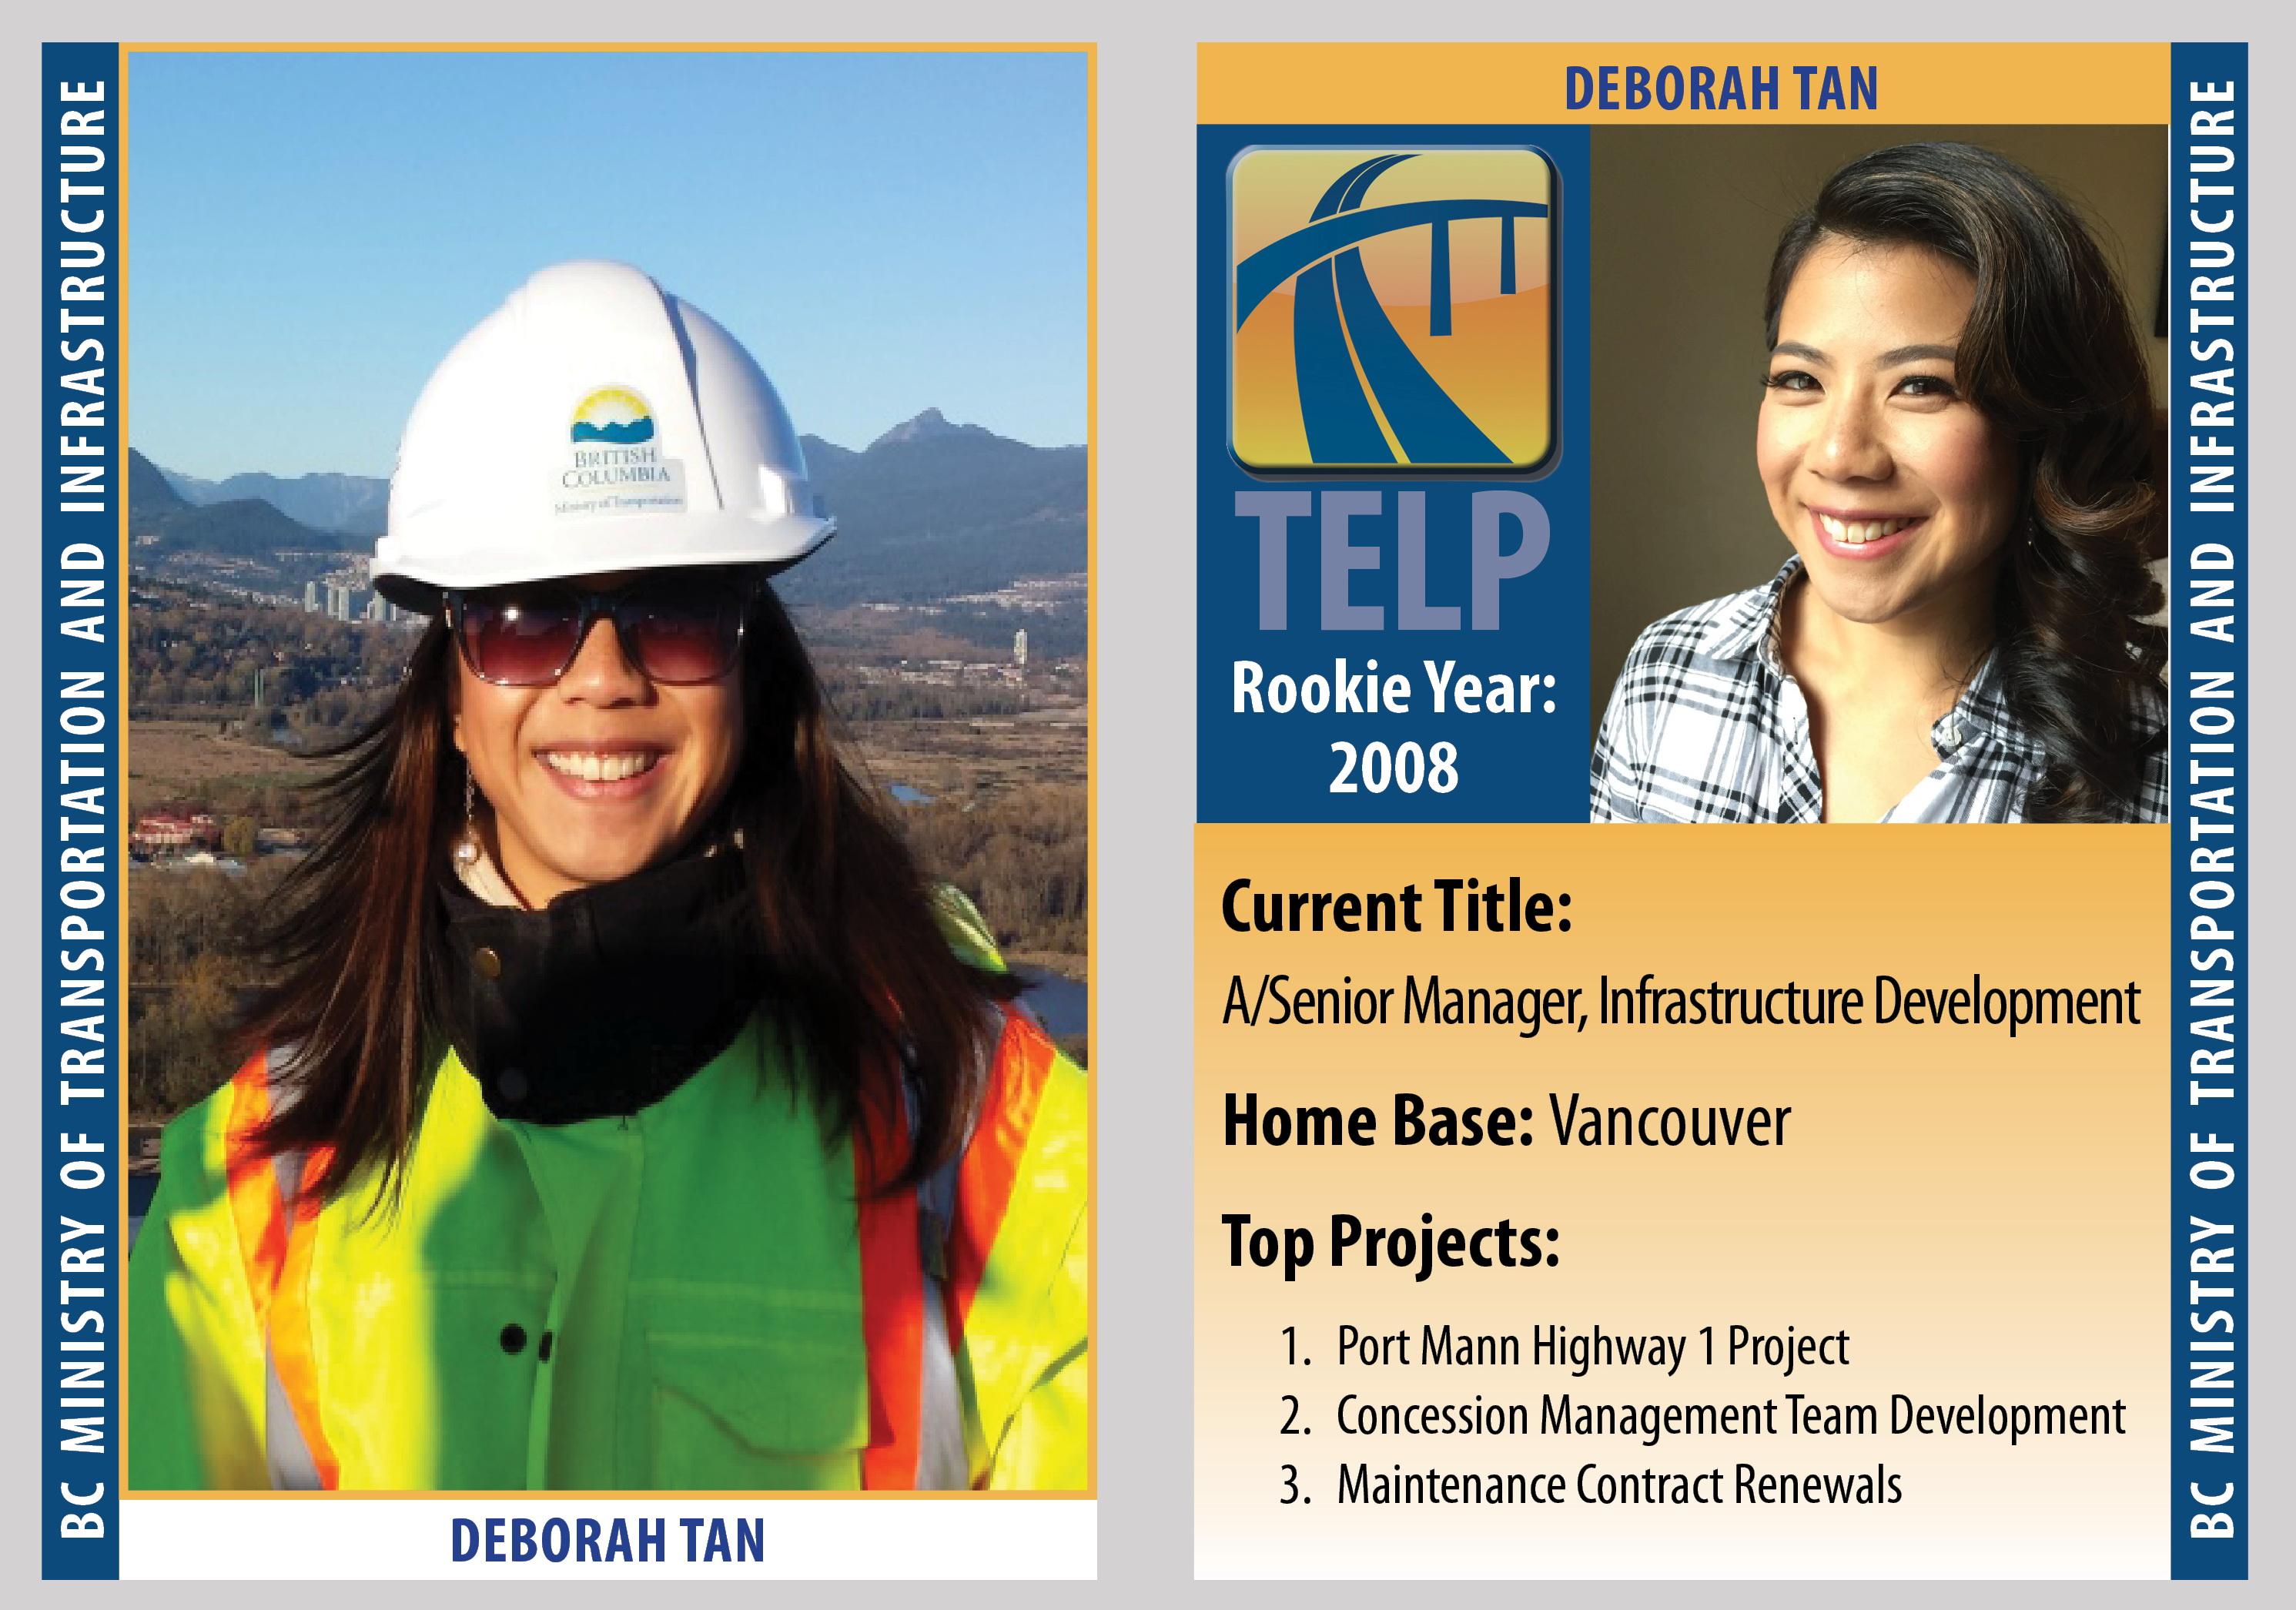 Deborah Tan